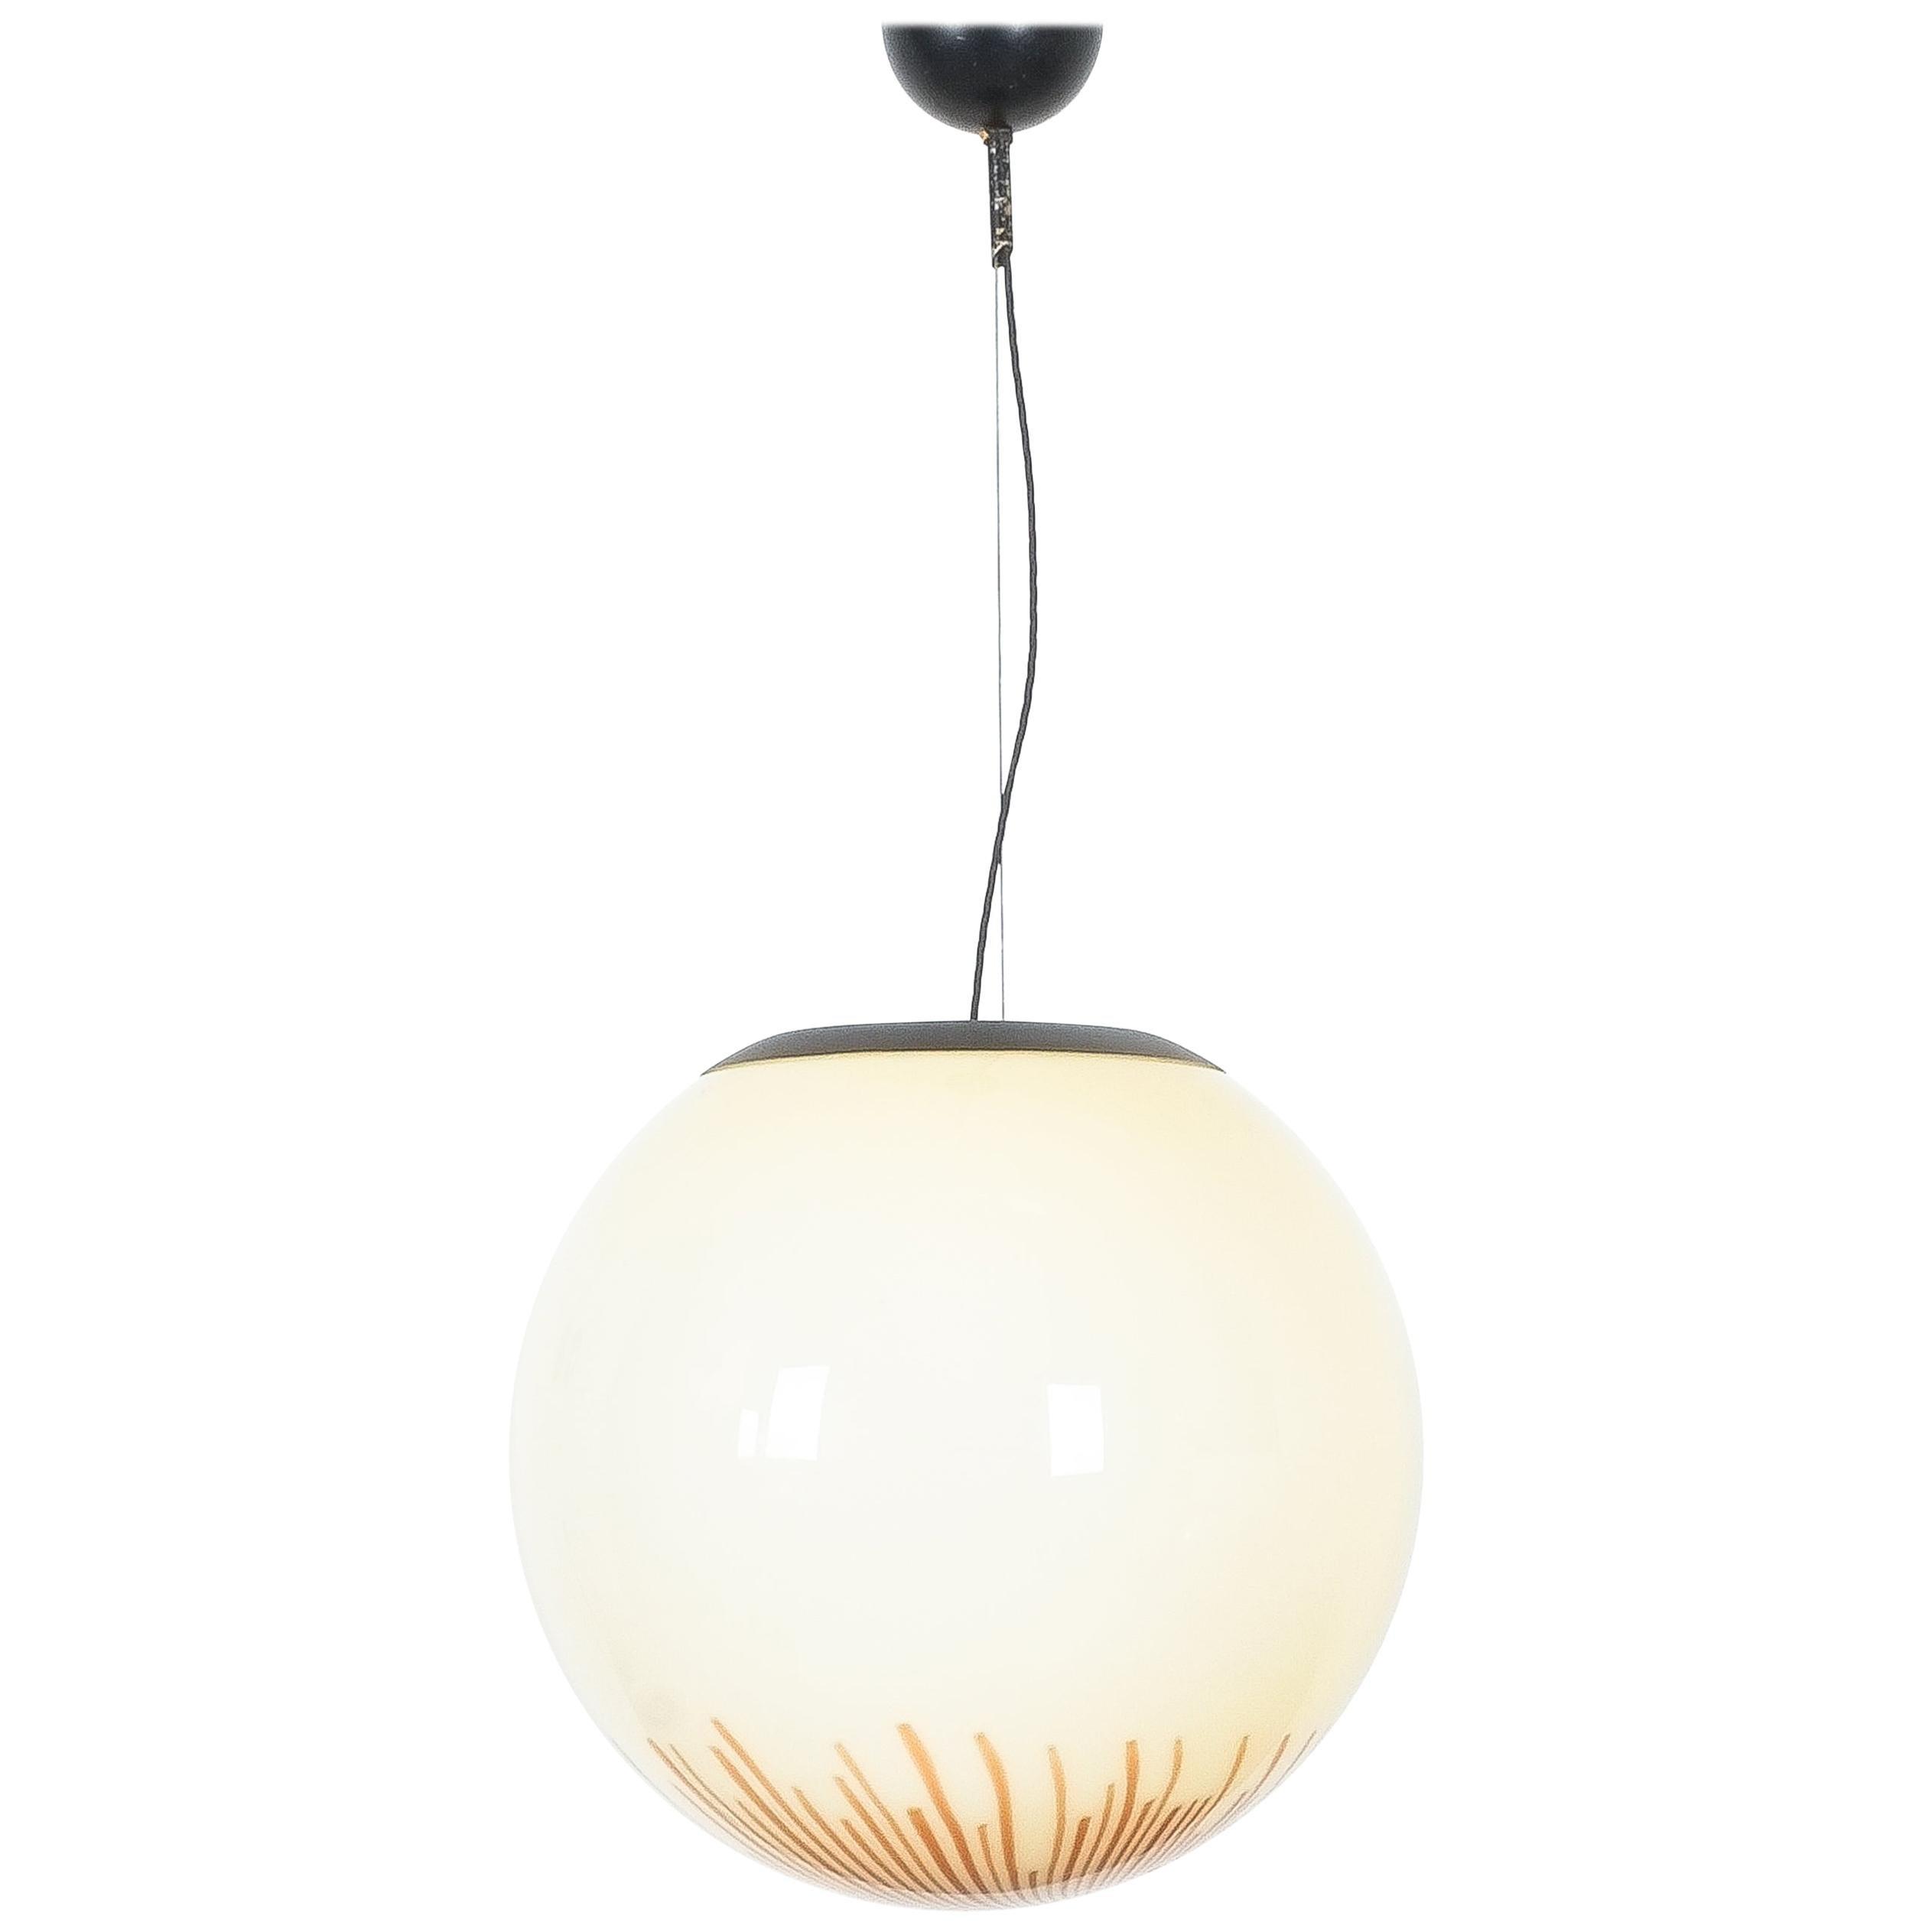 Ludovico Diaz de Santillana Glass Ball Pendant Lamp Anemone, Italy